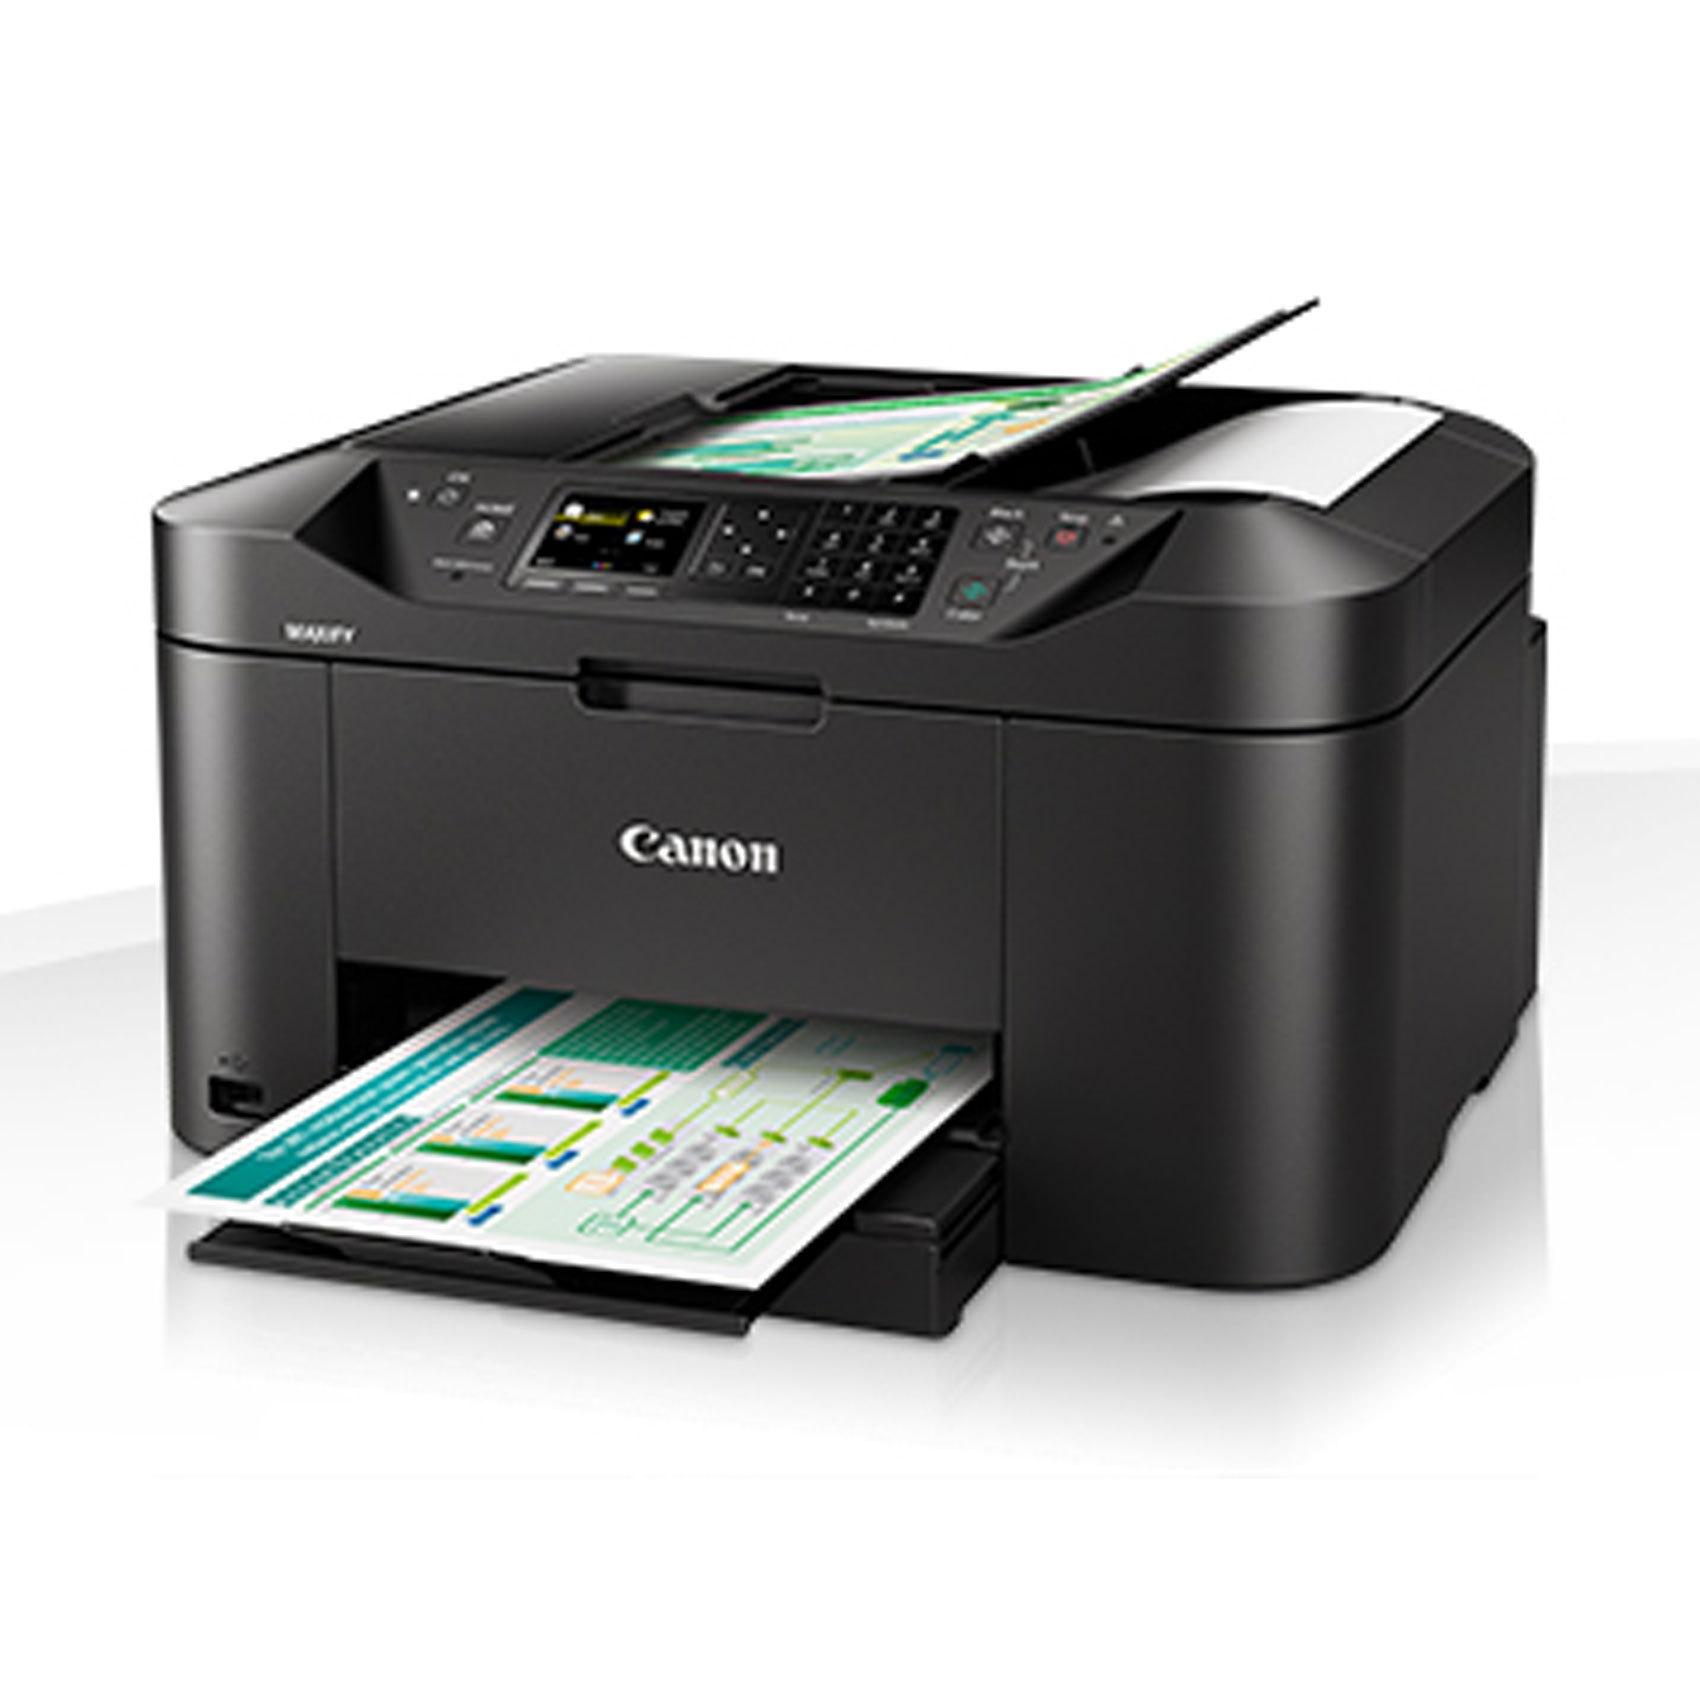 CANON PRINT AIO WIFI MB2140 MAXIFY